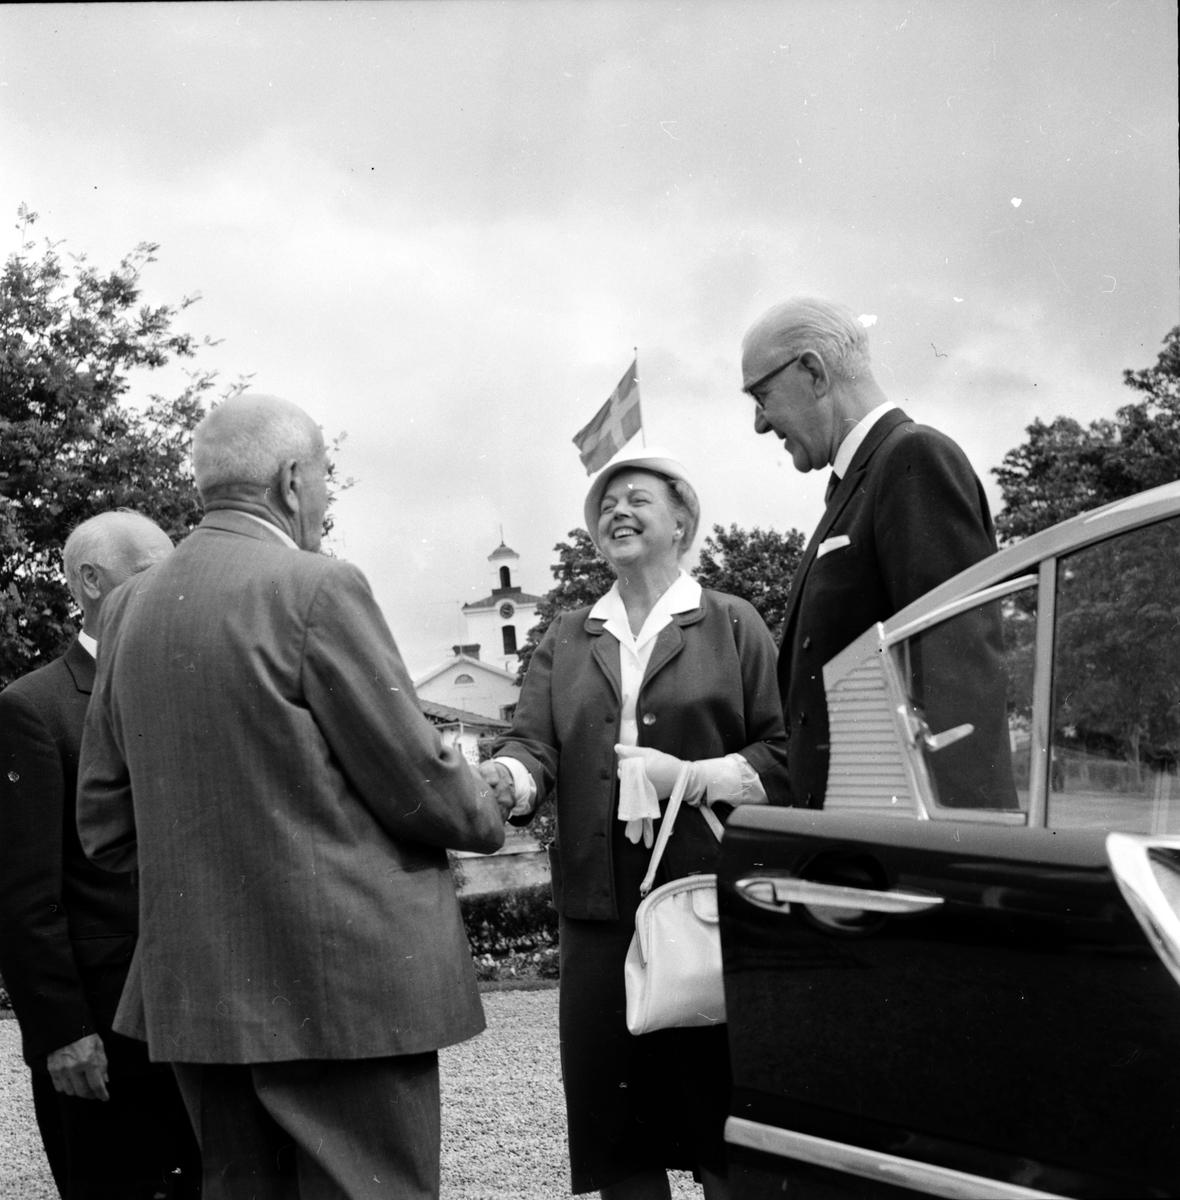 Skog, Landshövding,bessök, 24 Augusti 1962